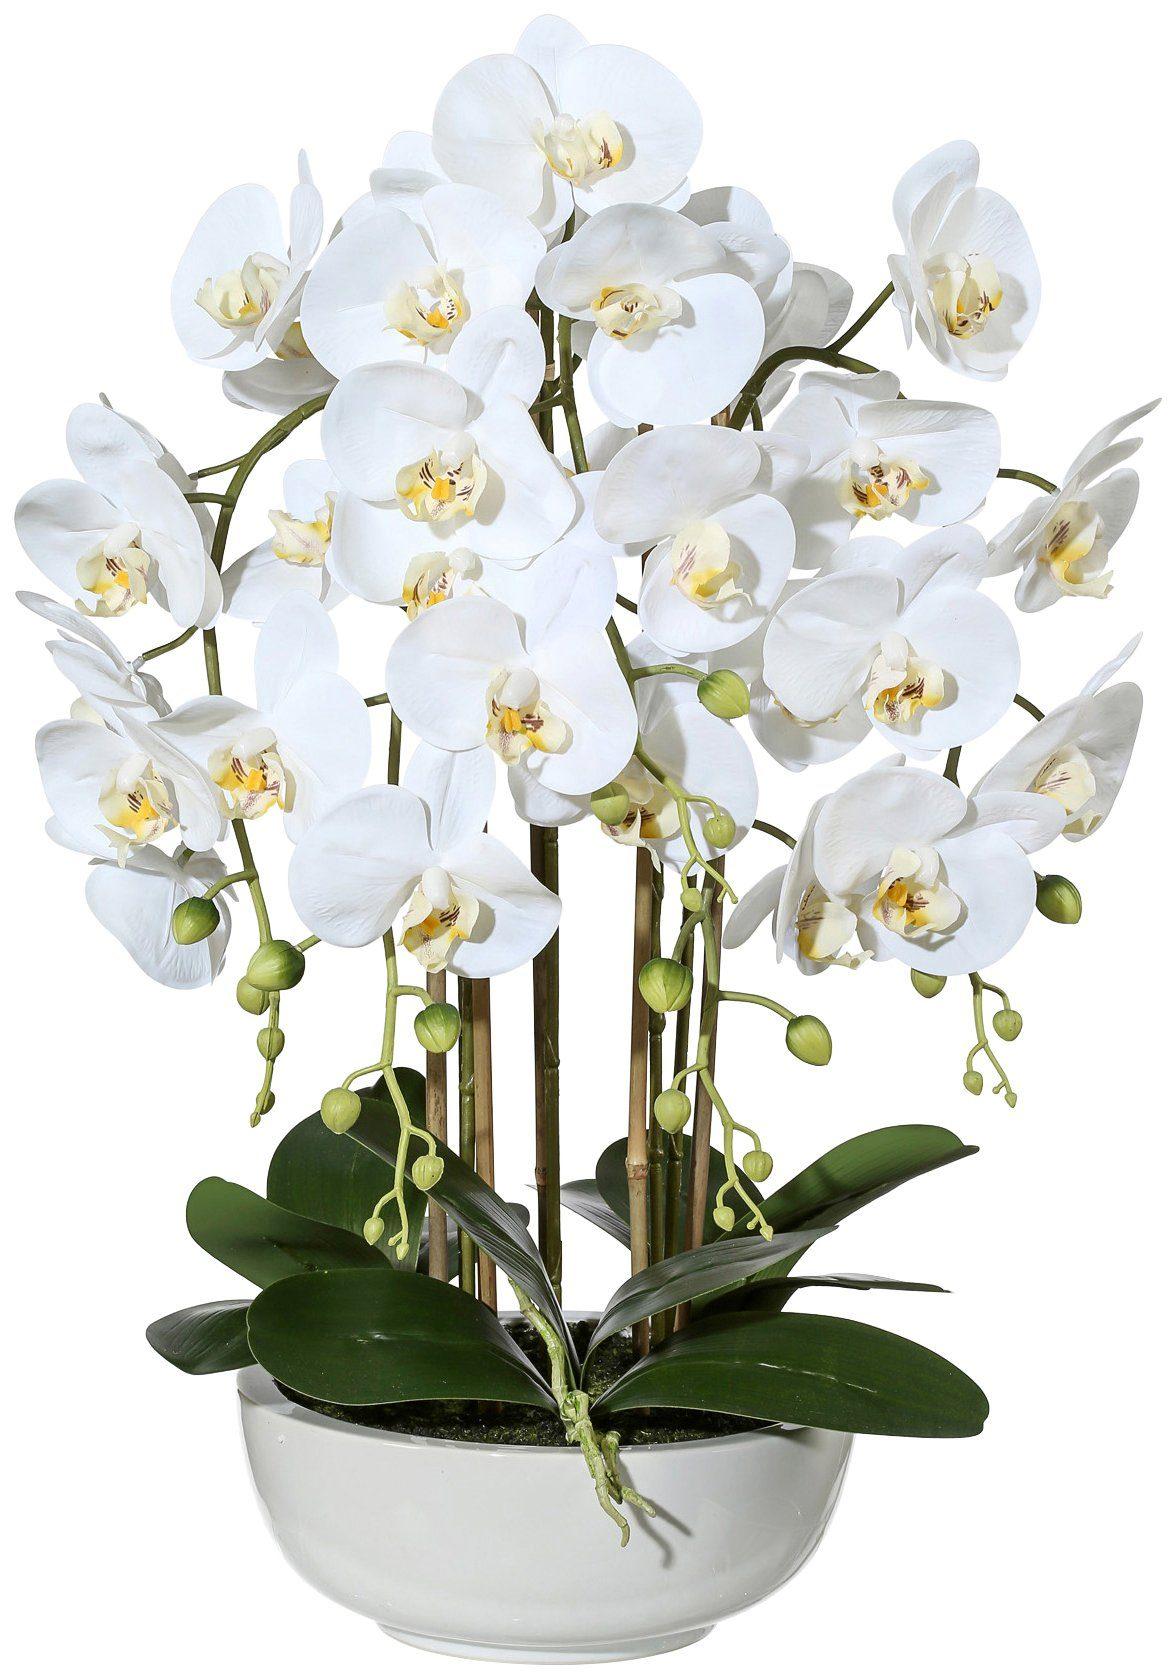 Kunstpflanze »Orchidee Phalaenopsis«, in Keramikschale, Höhe 66 cm, weiß